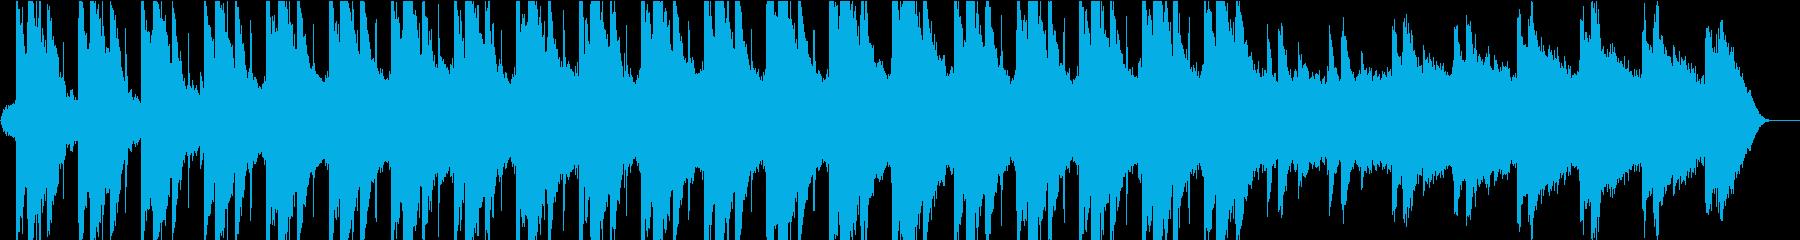 Surrenderの再生済みの波形